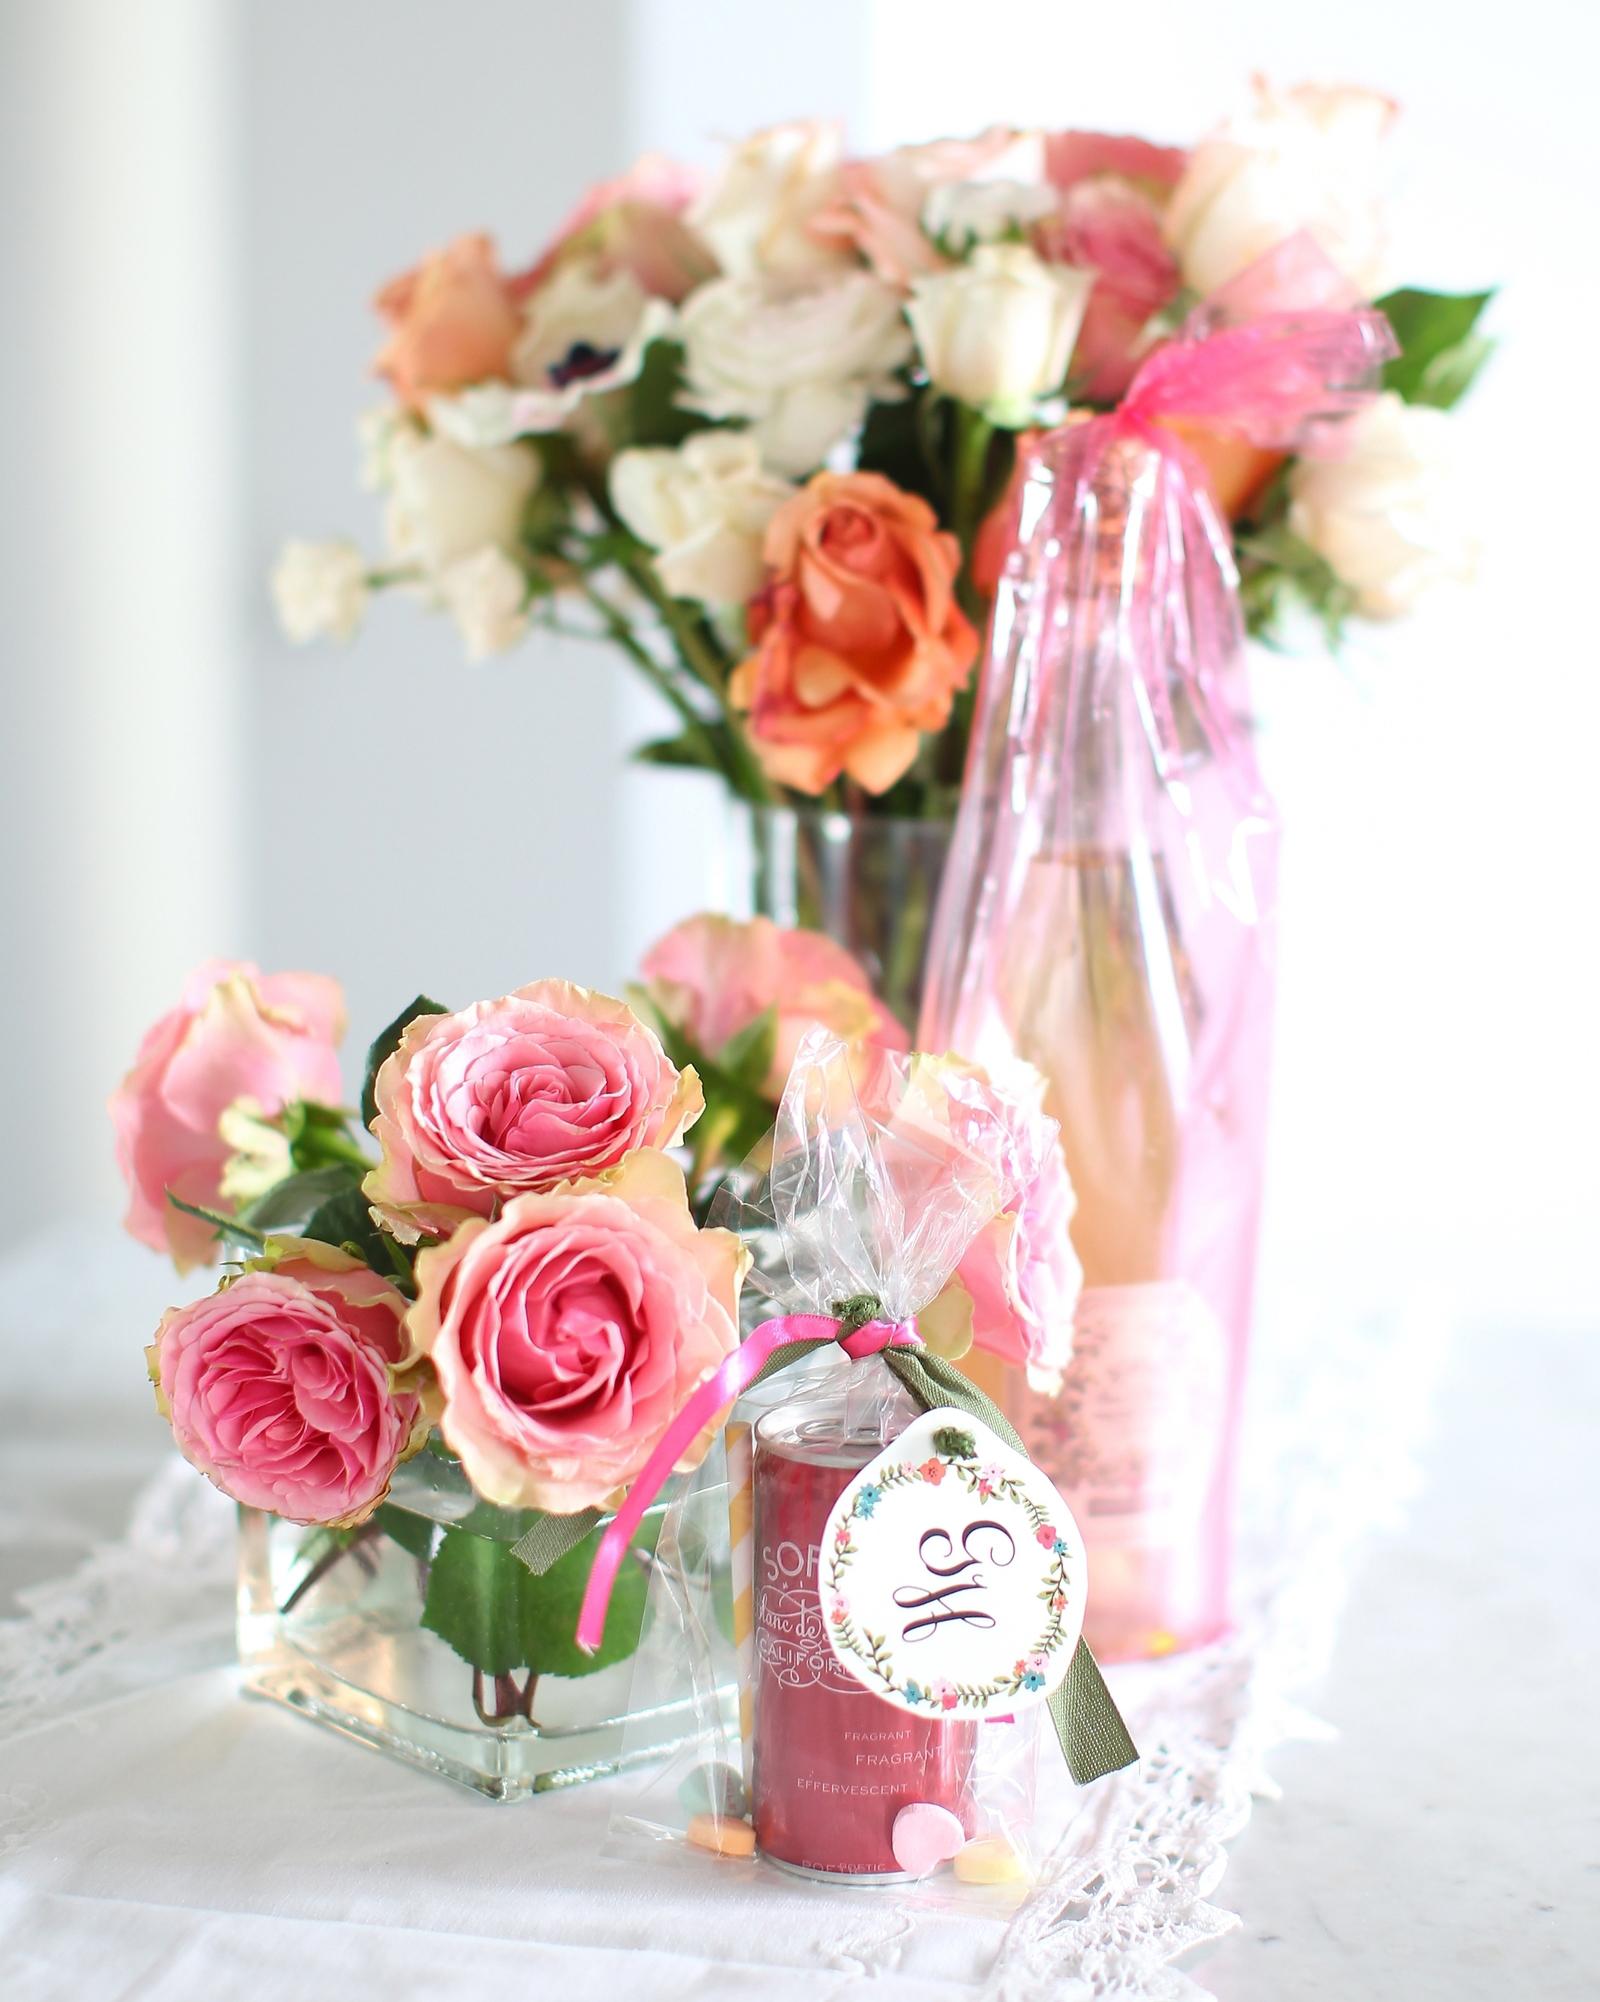 geri-hirsch-bridal-shower-tea-party-flowers-favors-0315.jpg